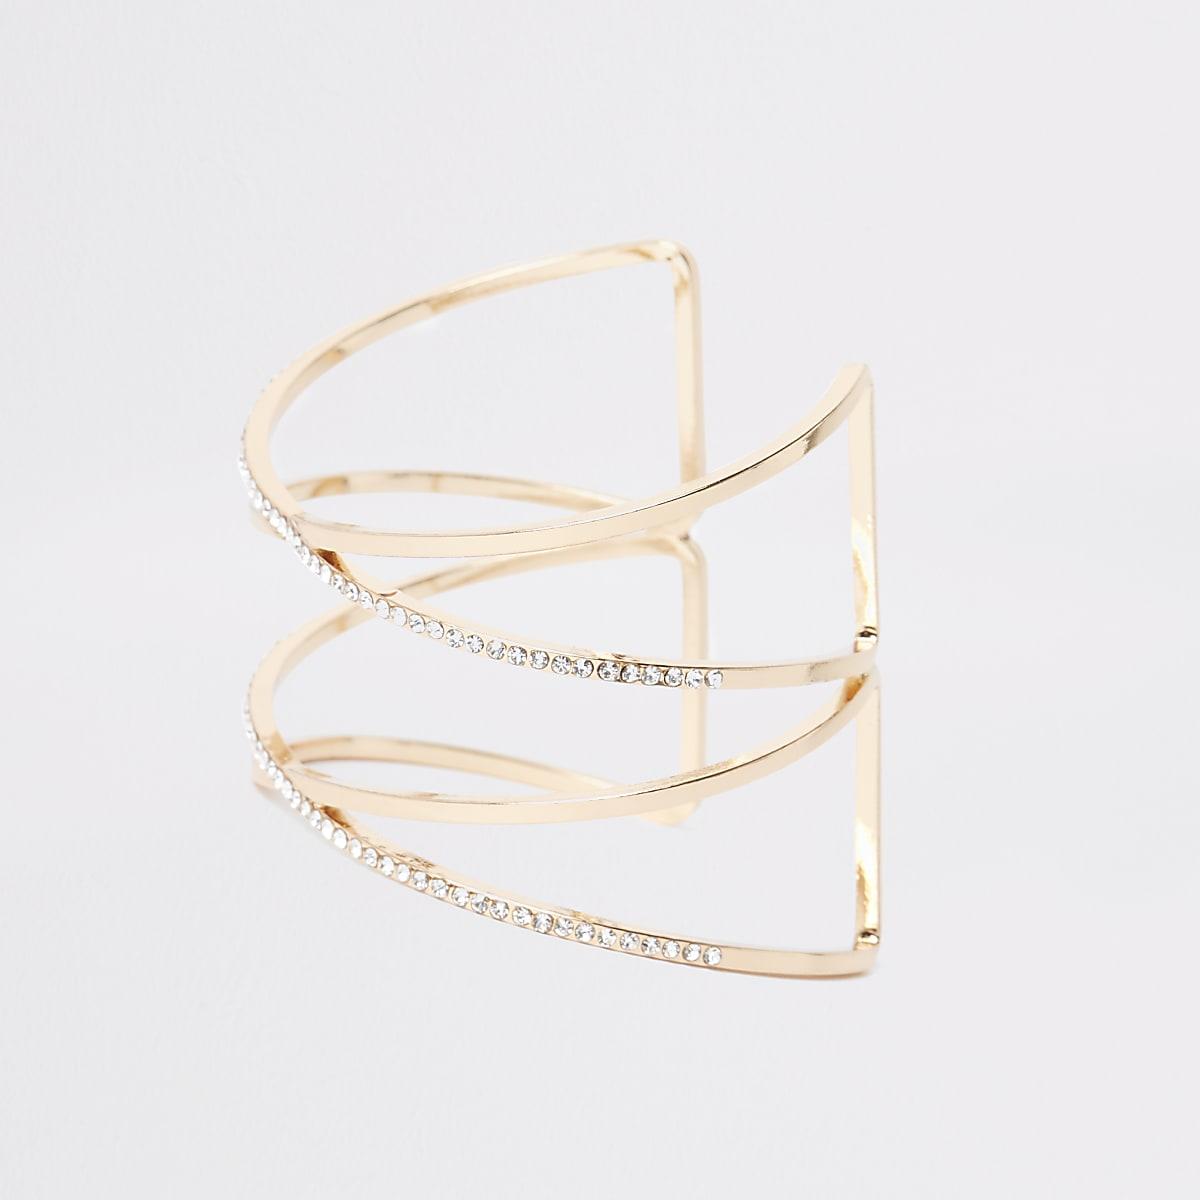 Gold color rhinestone cuff bracelet